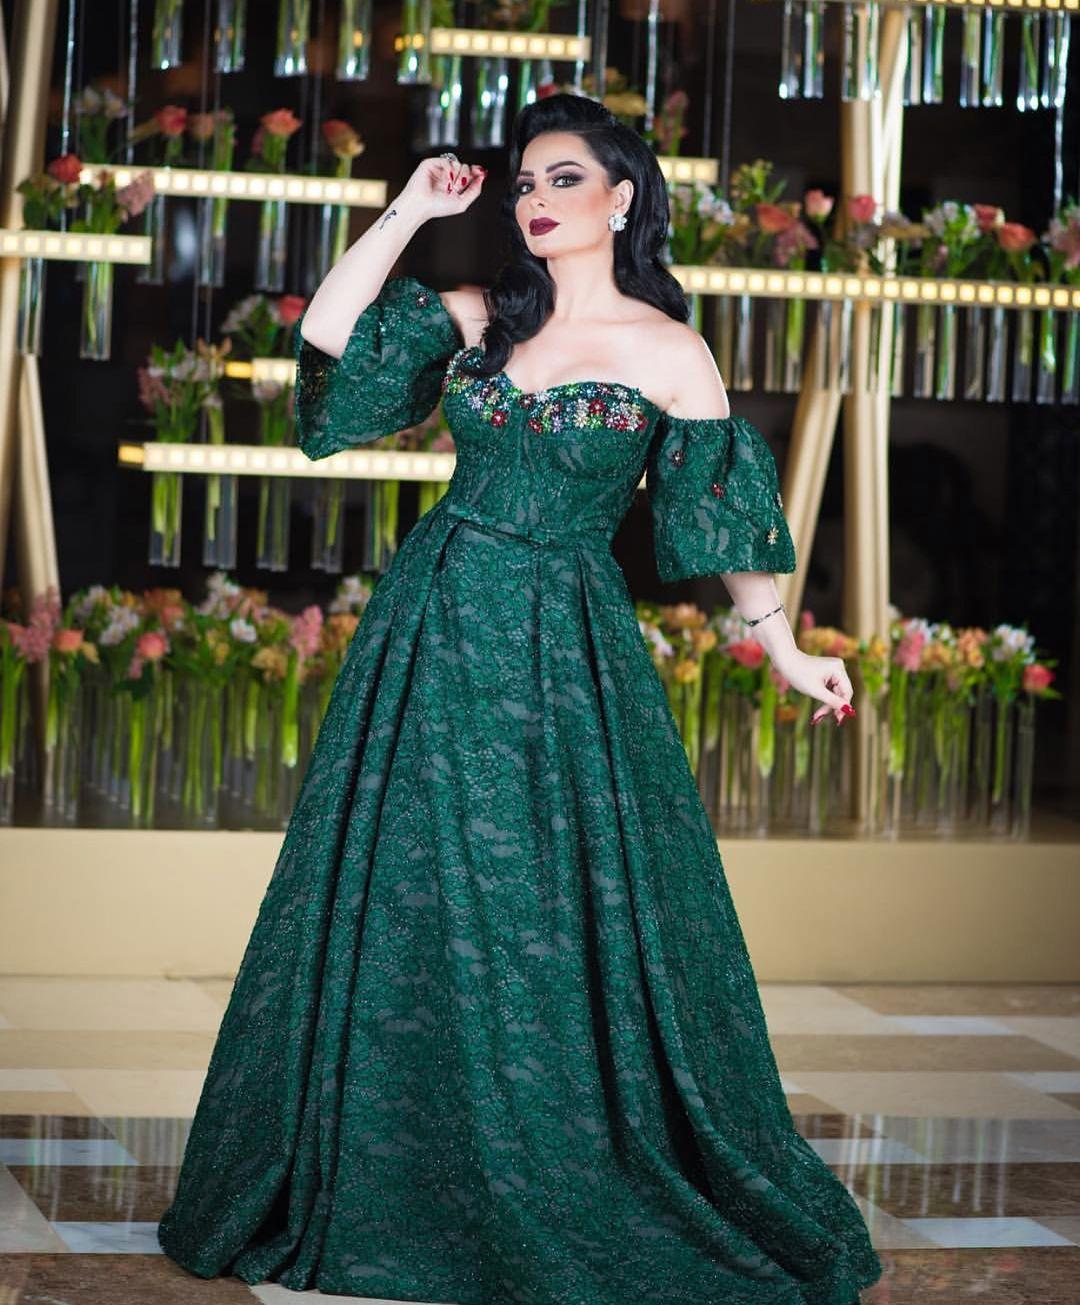 اخترنا لك اجمل فساتين انستقرام 2019 طويلة Dresses Strapless Dress Formal Fashion